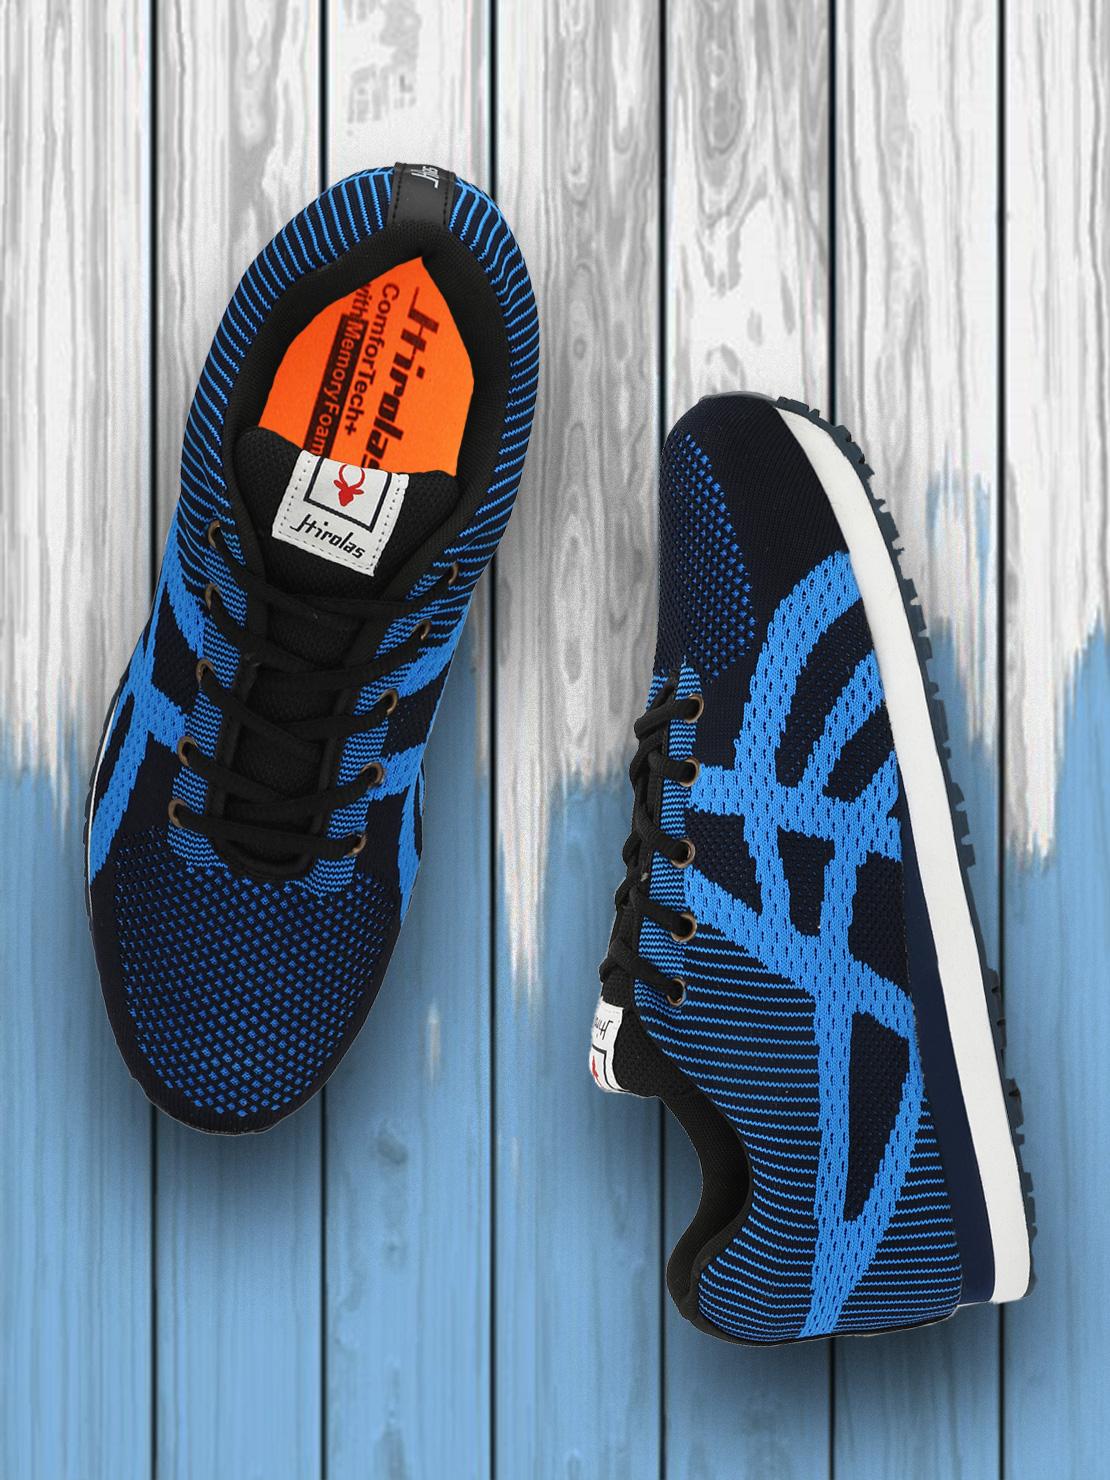 Hirolas   Hirolas Royal Multi Sport Shock Absorbing Walking  Running Fitness Athletic Training Gym Flyknit Sneaker Shoes - Blue/Sky Blue